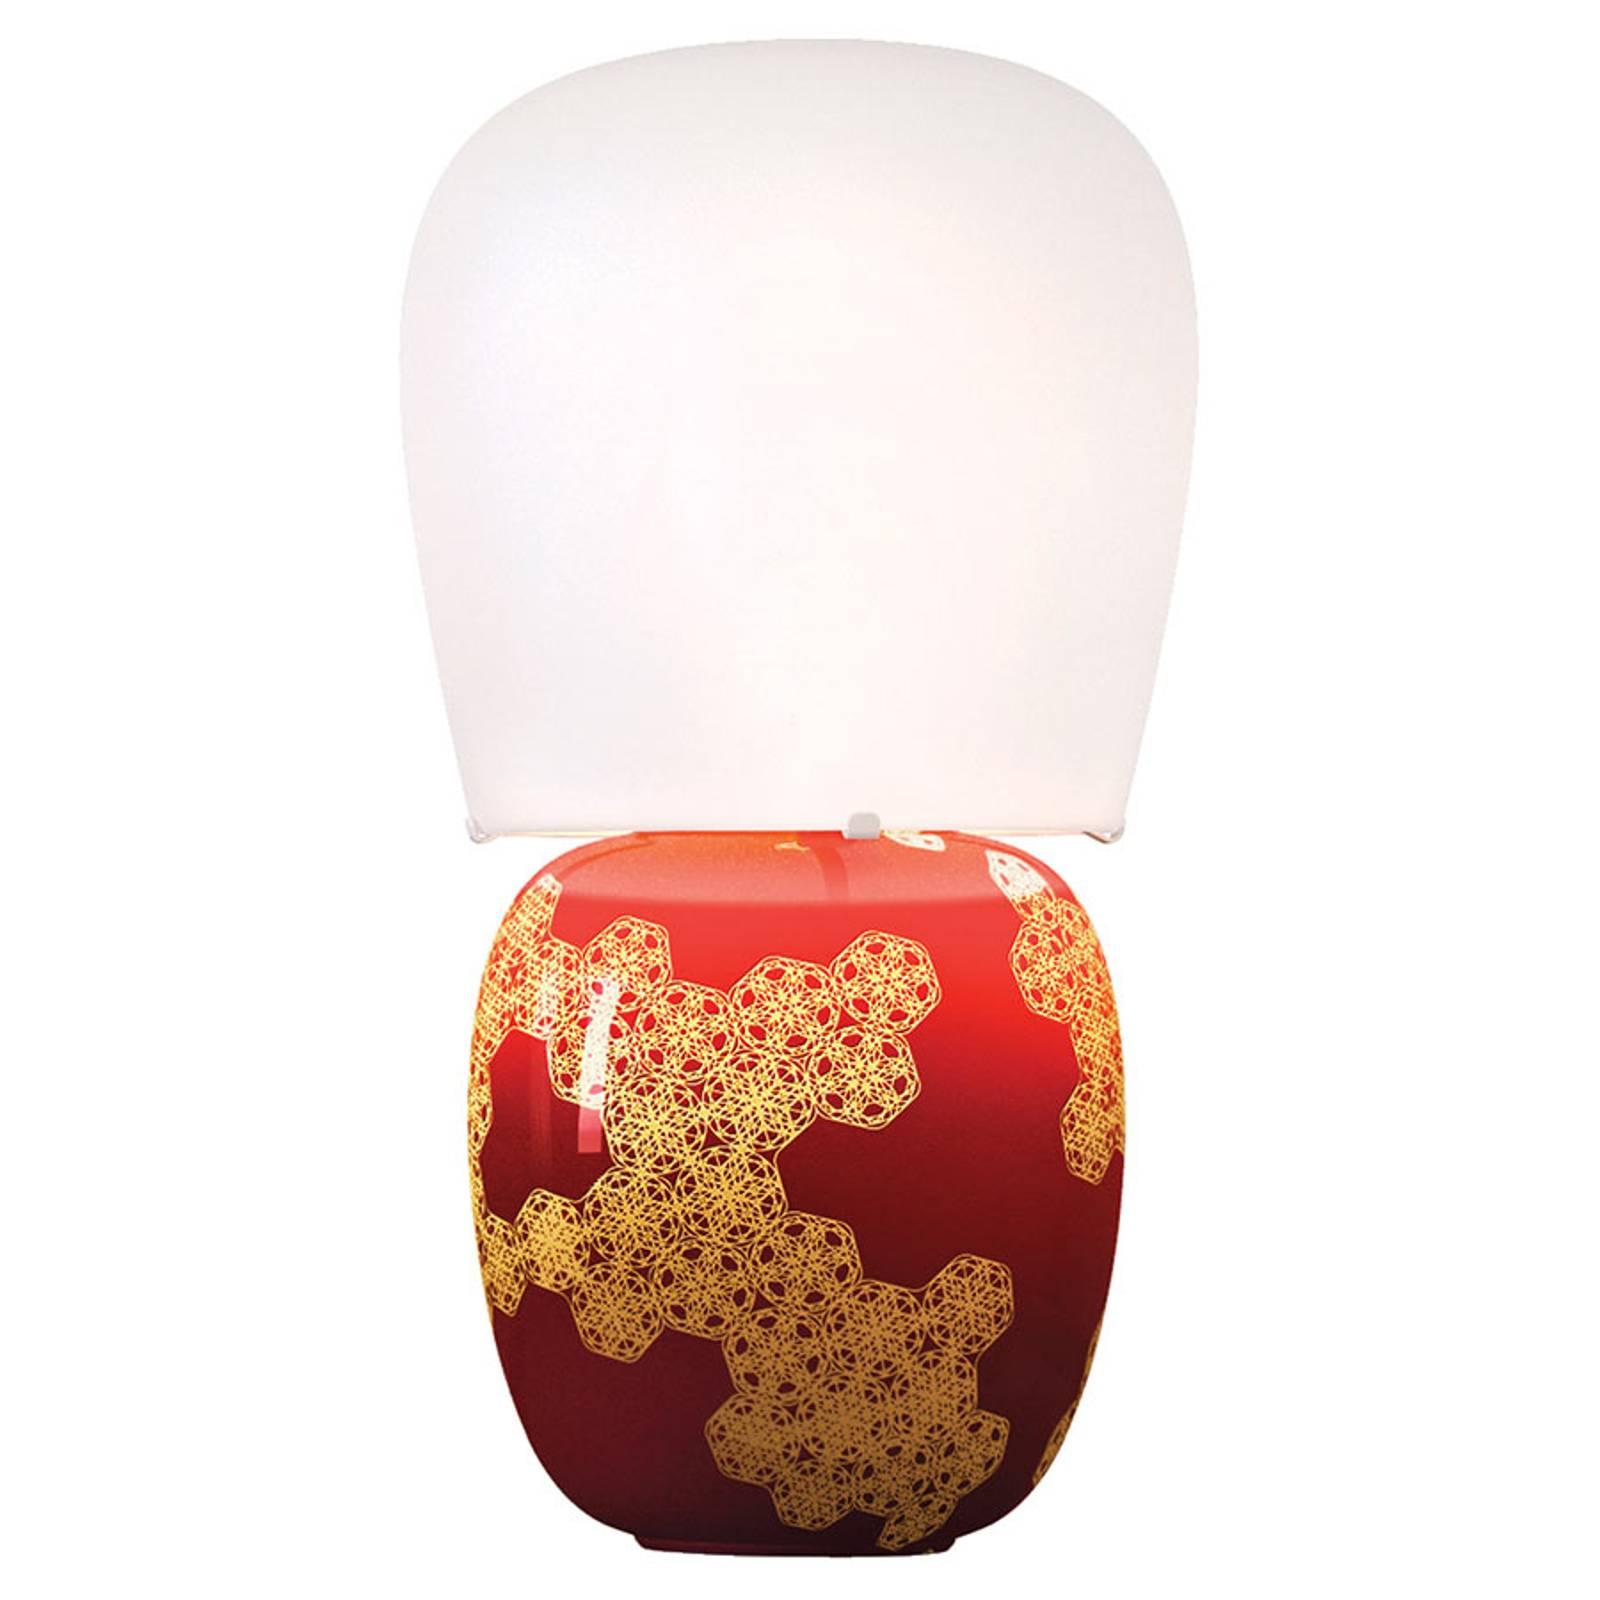 Kundalini Hive - Keramik-Tischleuchte, rot